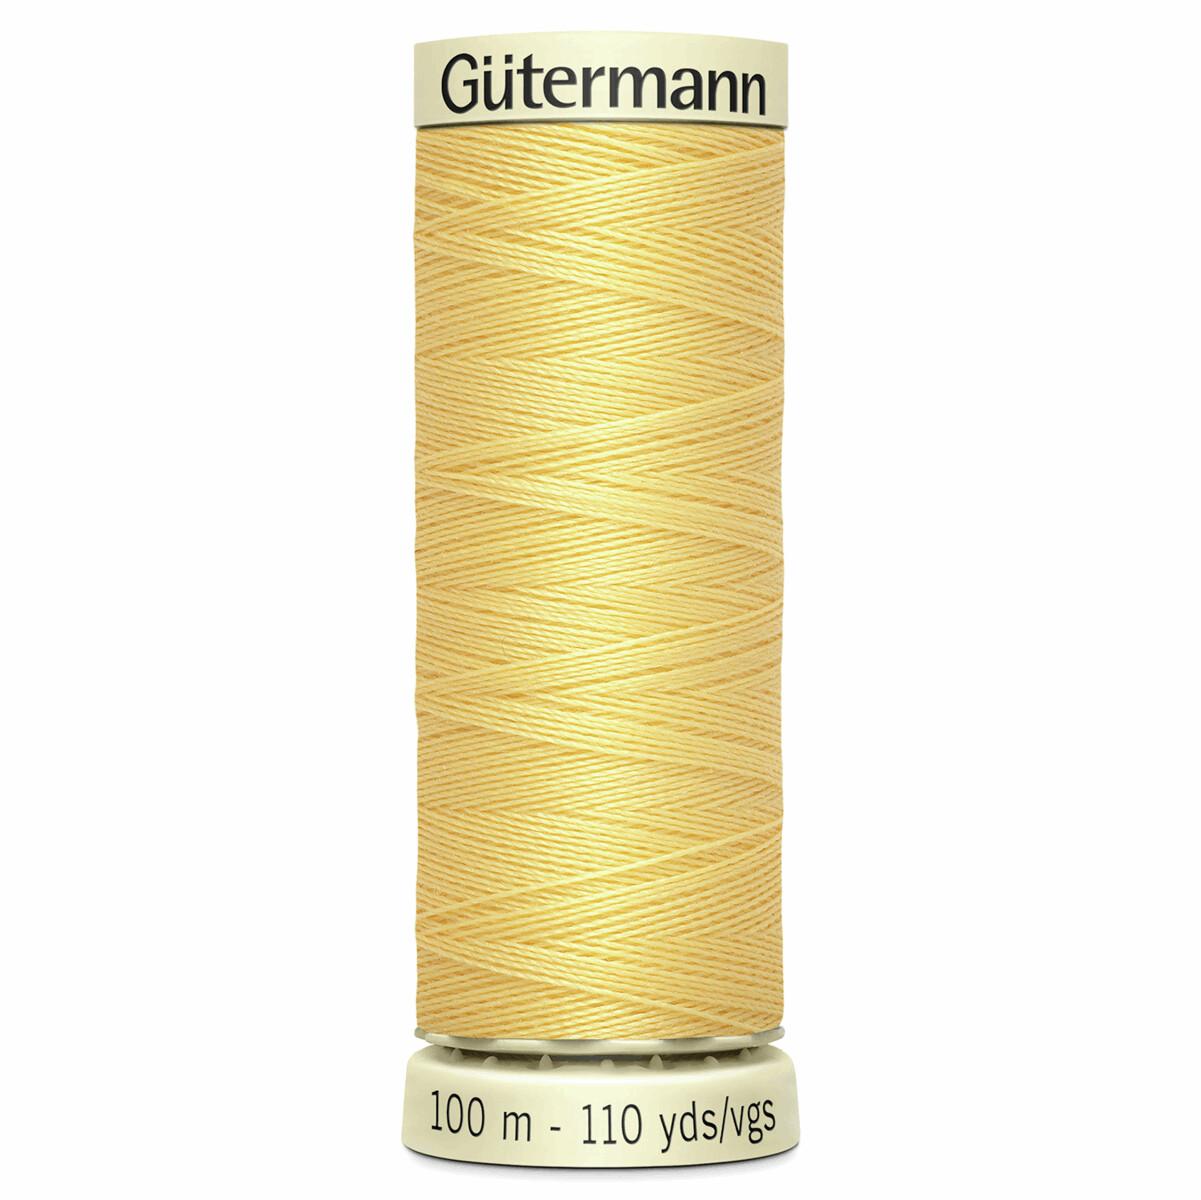 Gutermann Sew-All thread 7